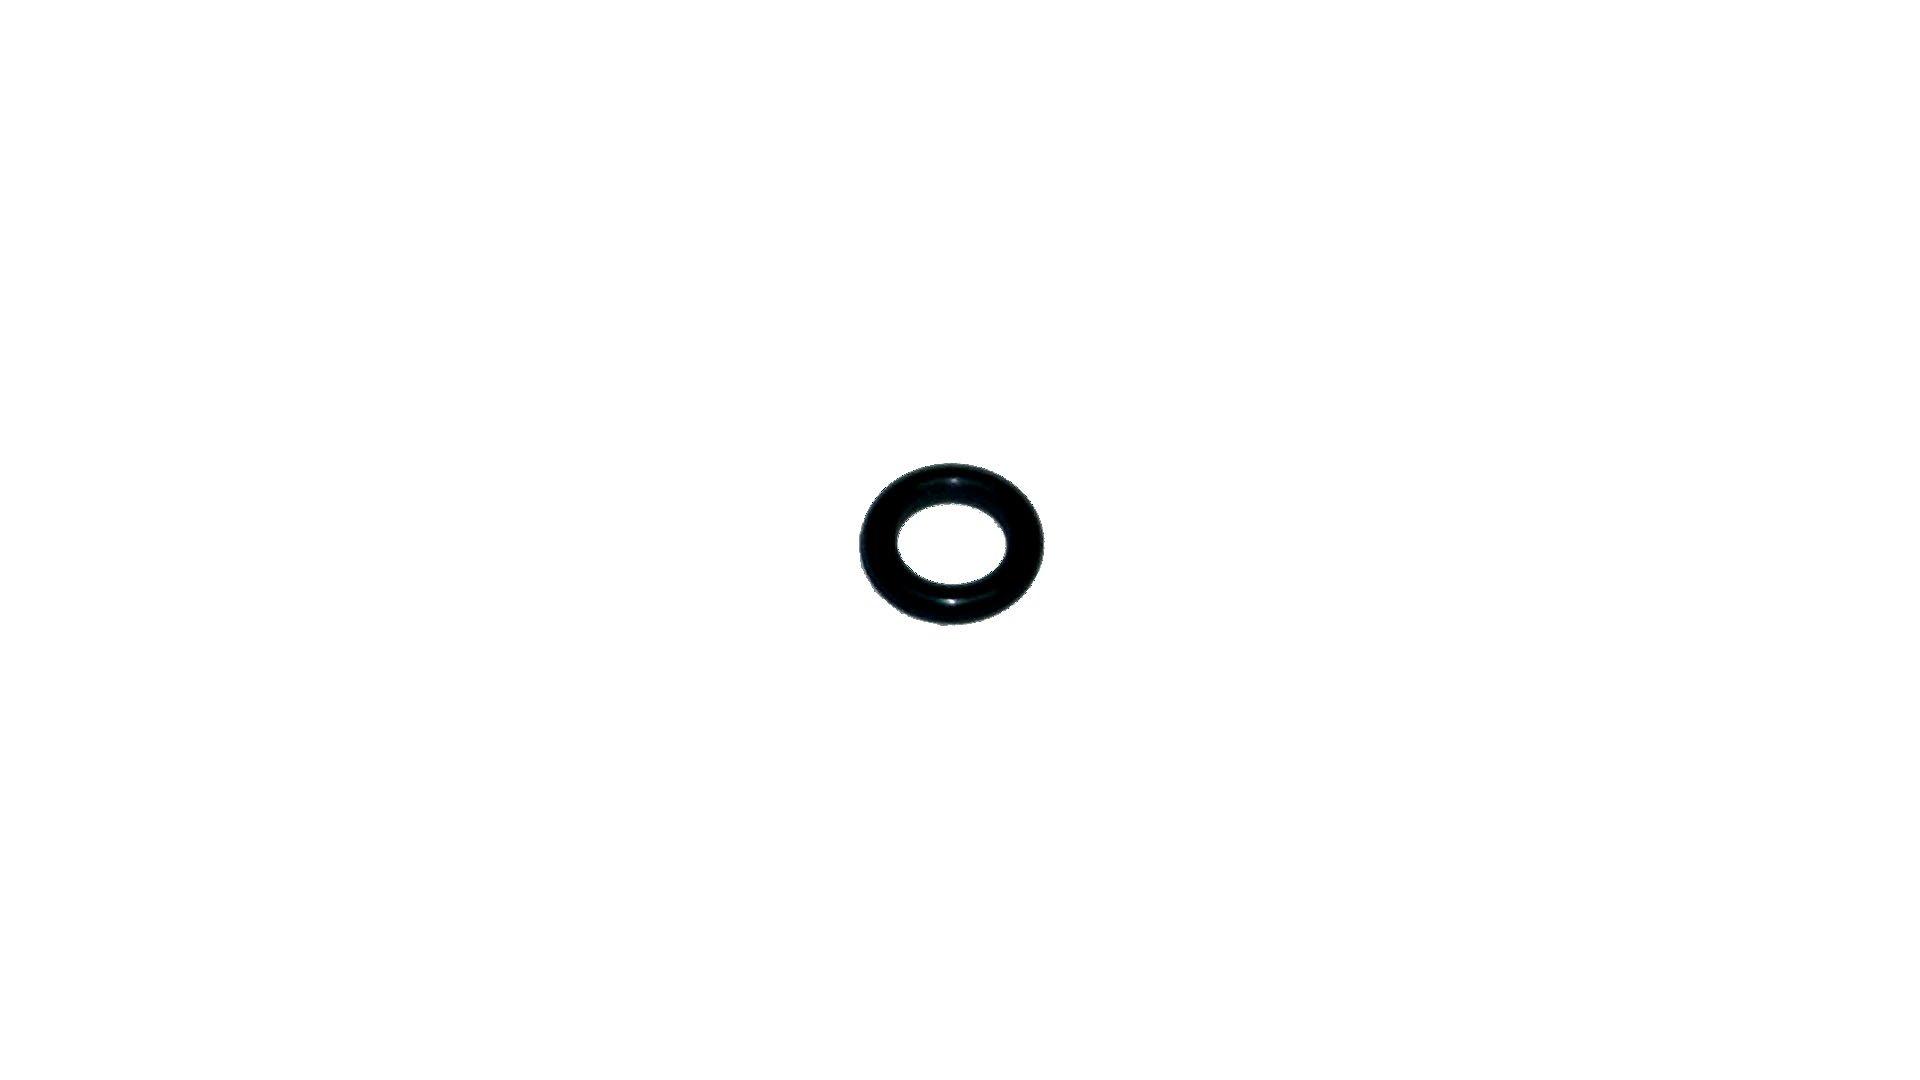 Sterling Seal ORBN108x1000 Number-108 Standard O-Ring, Buna Nitrile Rubber, 70 Durometer Hardness, 1/4'' ID, 7/16'' OD (Pack of 1000)